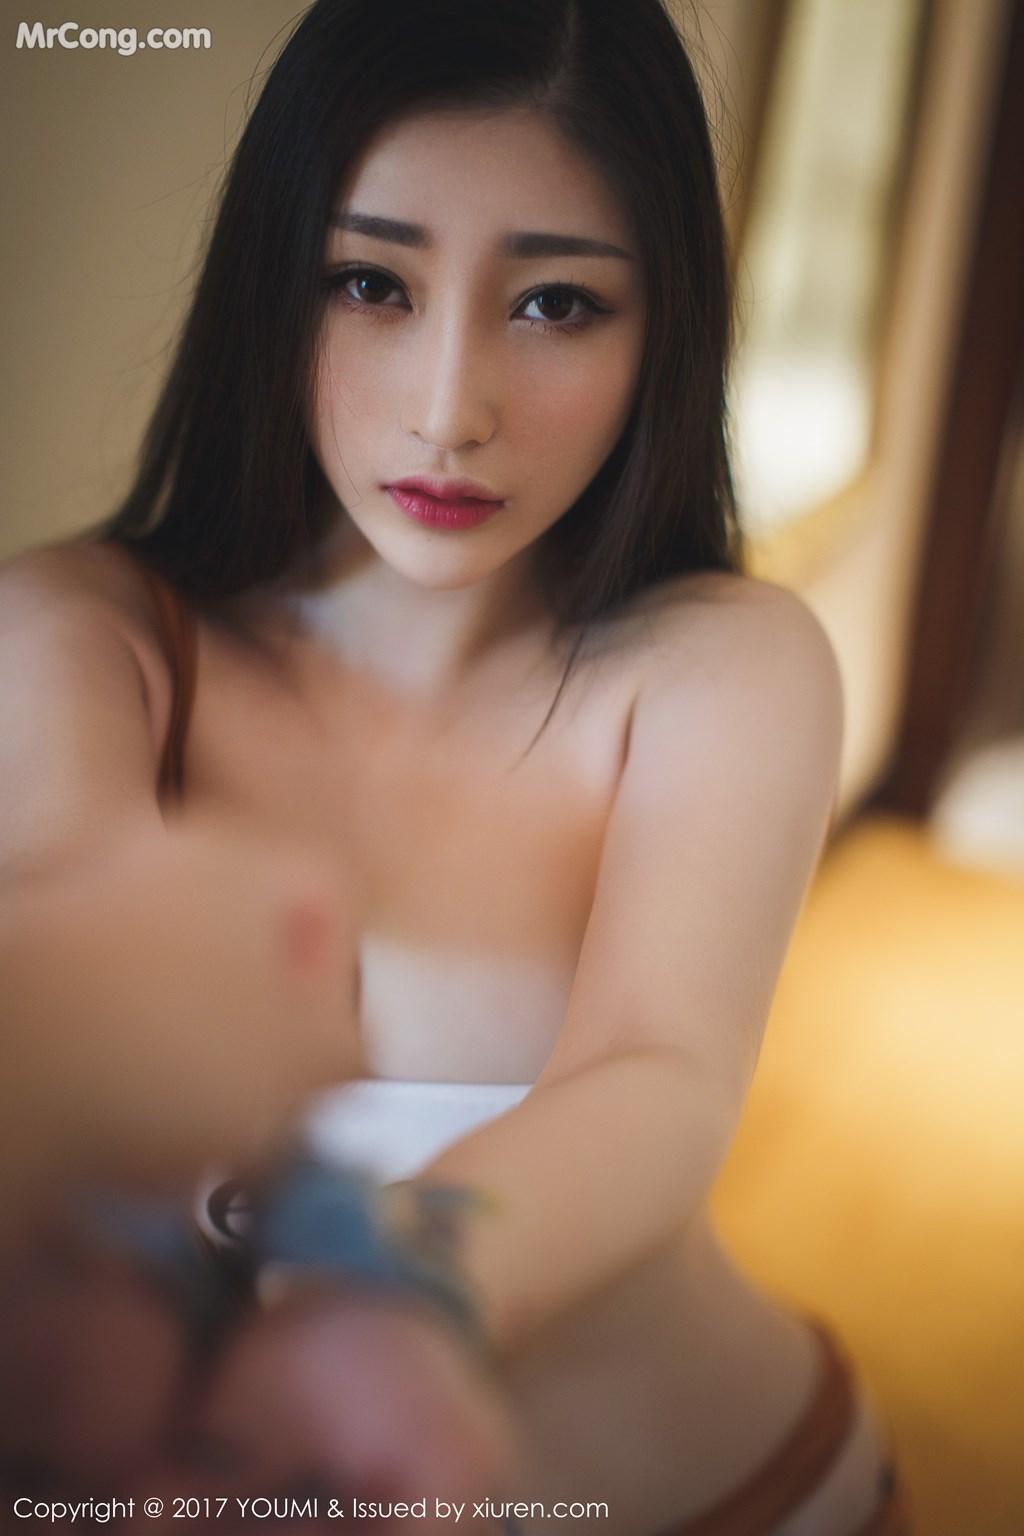 Image YouMi-Vol.077-Daji-Toxic-MrCong.com-003 in post YouMi Vol.077: Người mẫu Daji_Toxic (妲己_Toxic) (49 ảnh)